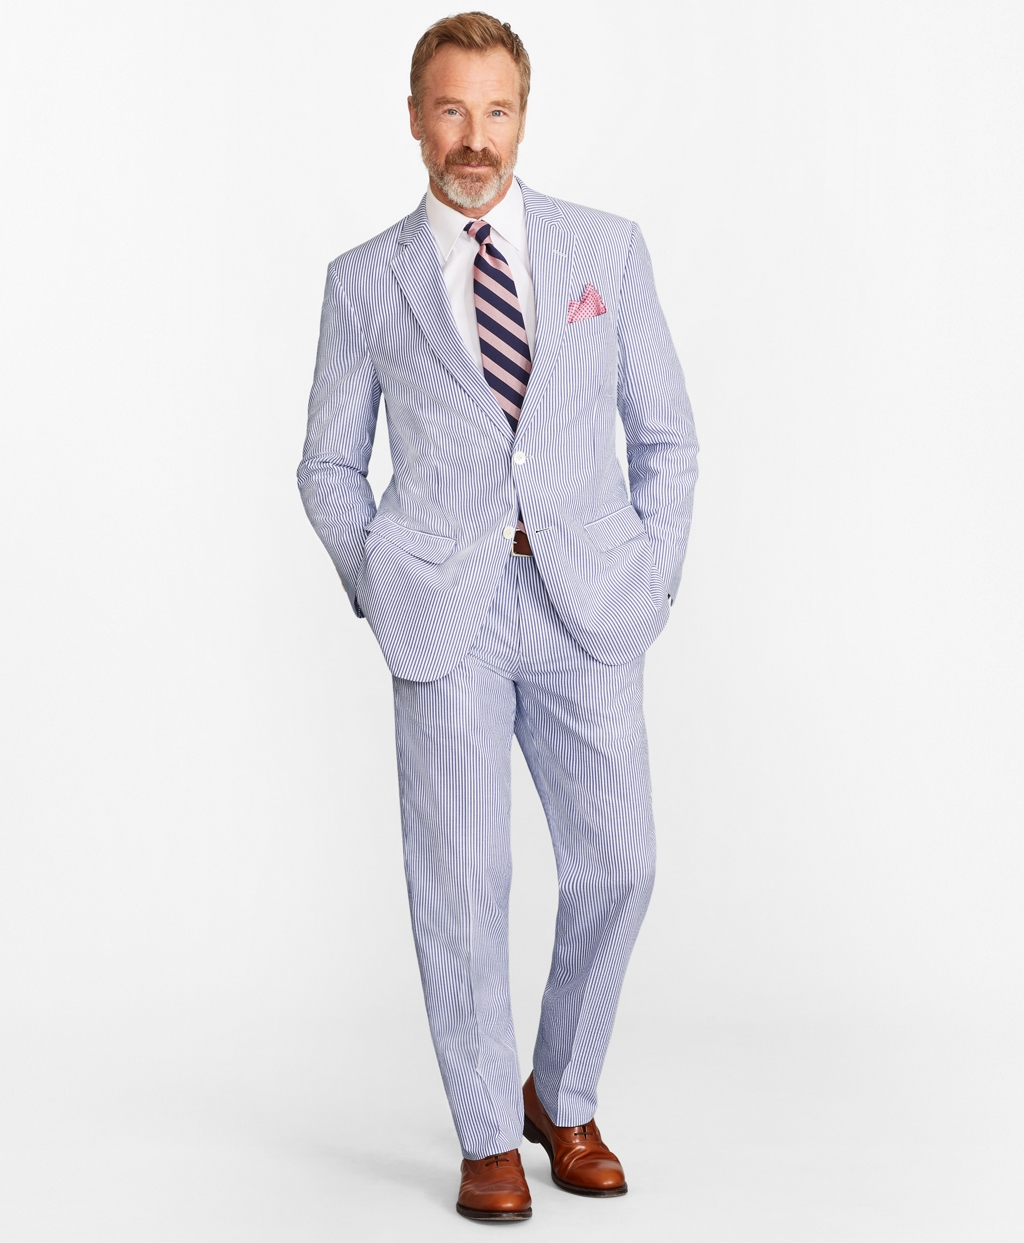 1900s Edwardian Men's Suits and Coats Brooks Brothers Mens Madison Fit Stripe Seersucker Suit $498.00 AT vintagedancer.com